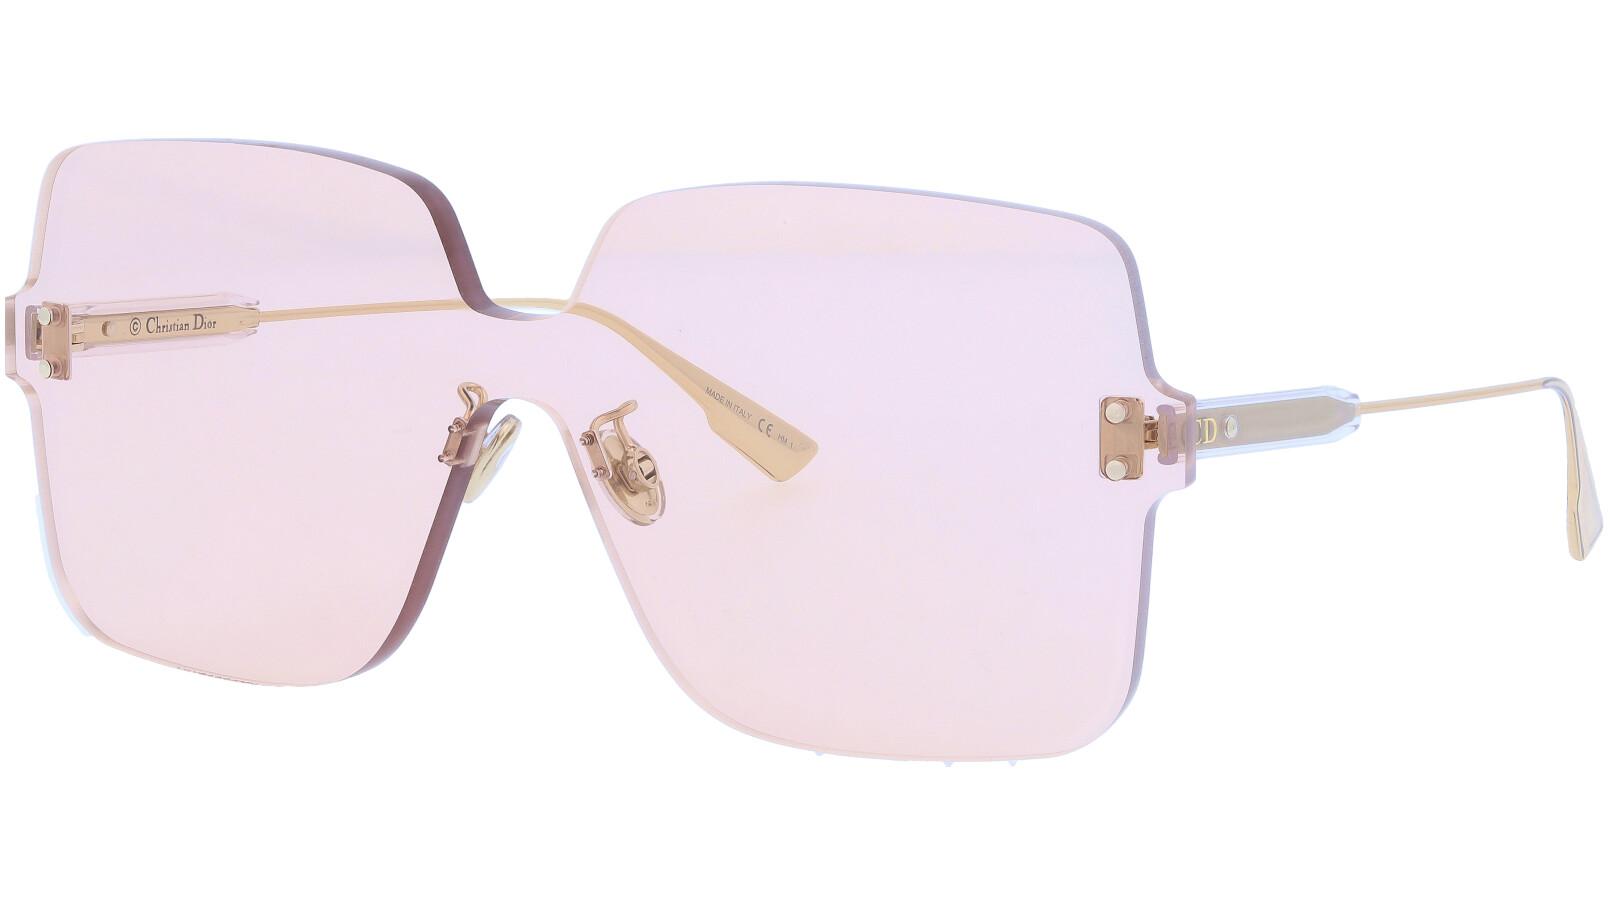 DIOR DIORCOLORQUAKE1 FWMVC 99 NUDE Sunglasses